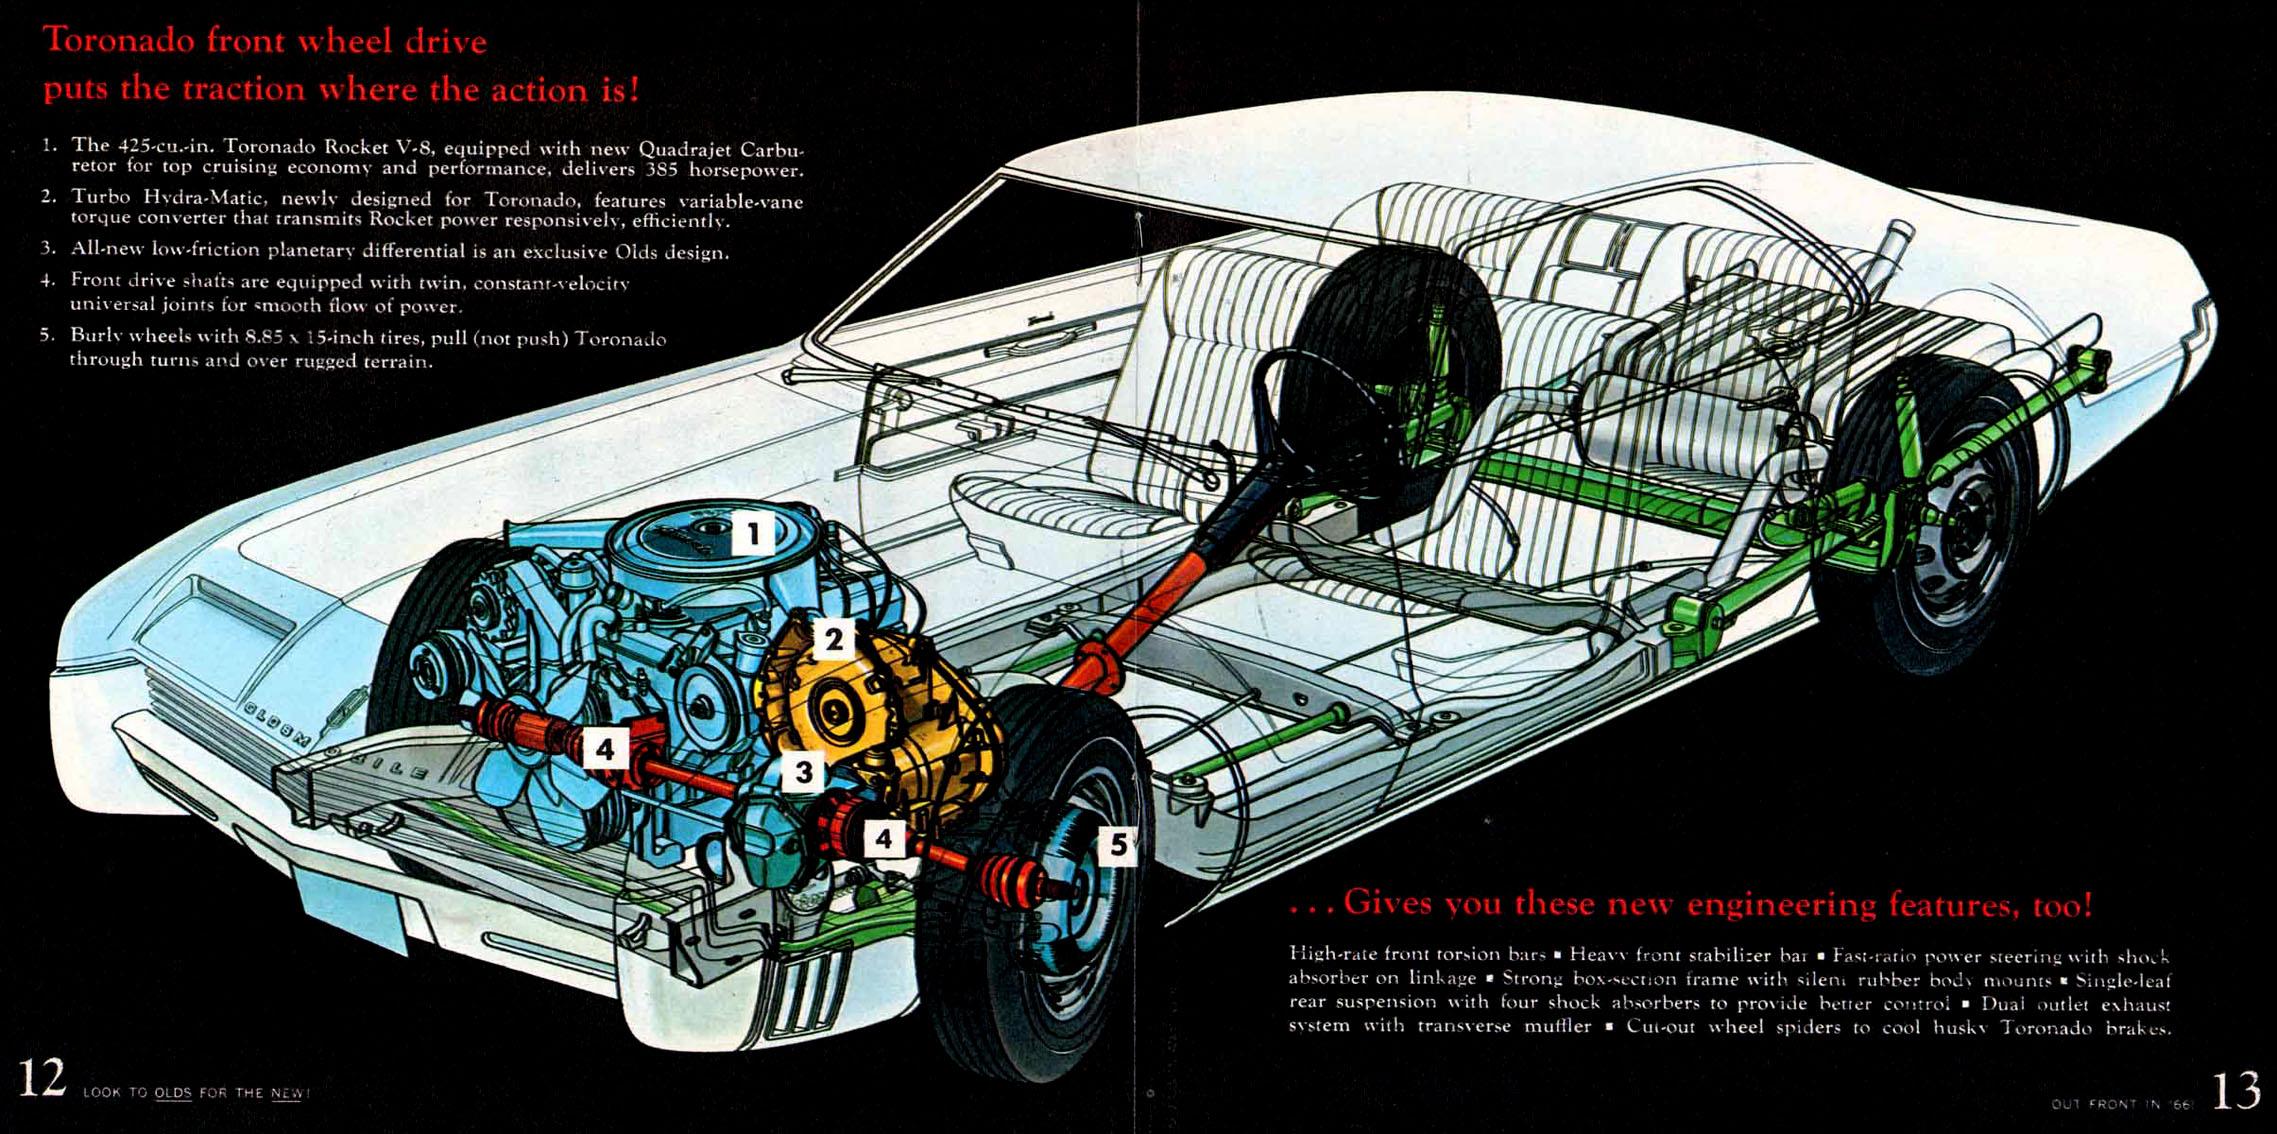 91 Oldsmobile Toronado Wiring Diagram Trusted Wiring Diagram 1970 Toronado  1972 Toronado Wiring Diagrams